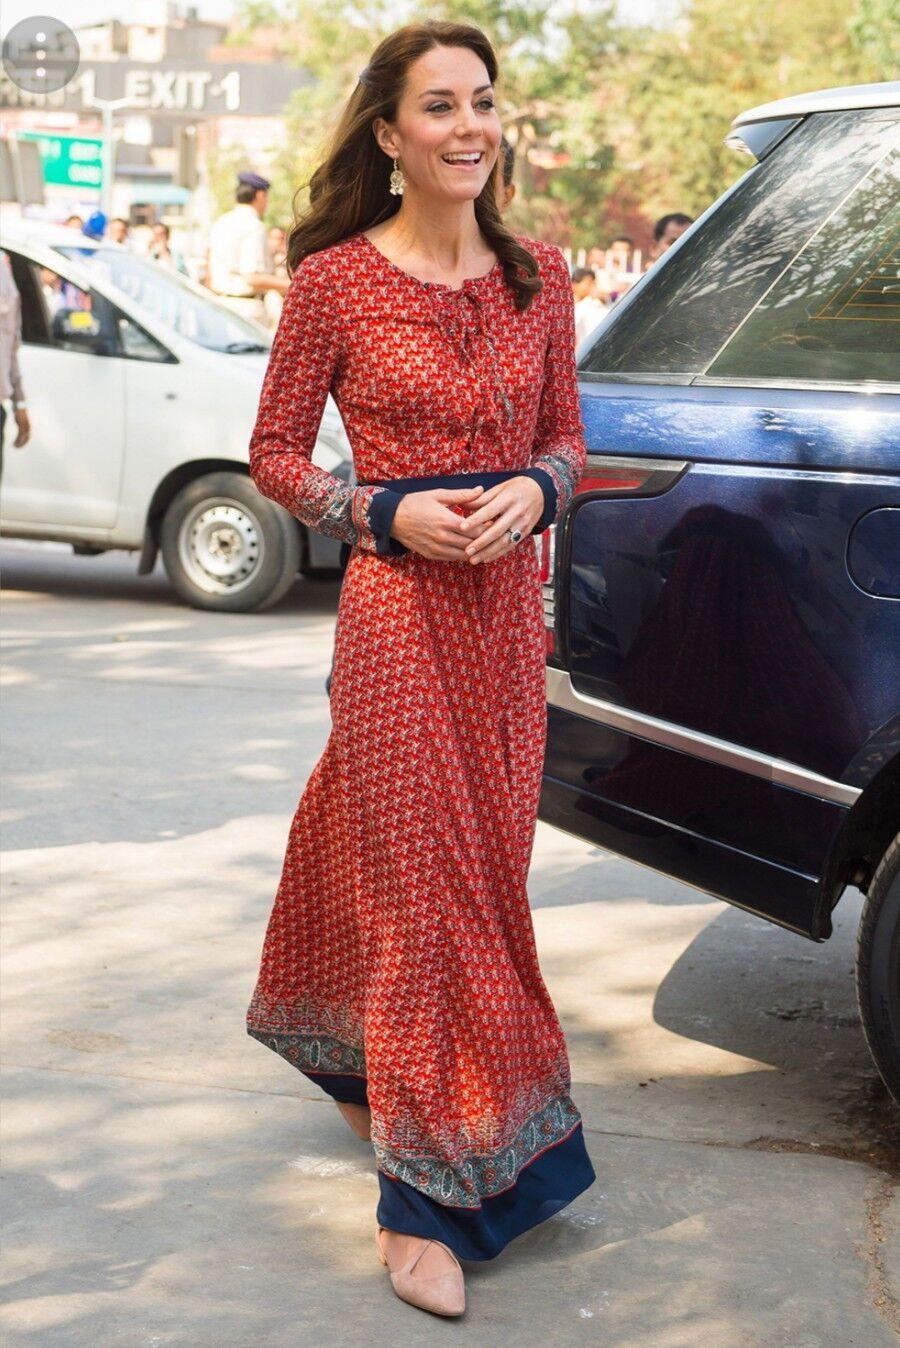 Glamgoldus Royal Sari Maxi Dress, Size M. BNWT. Stunning